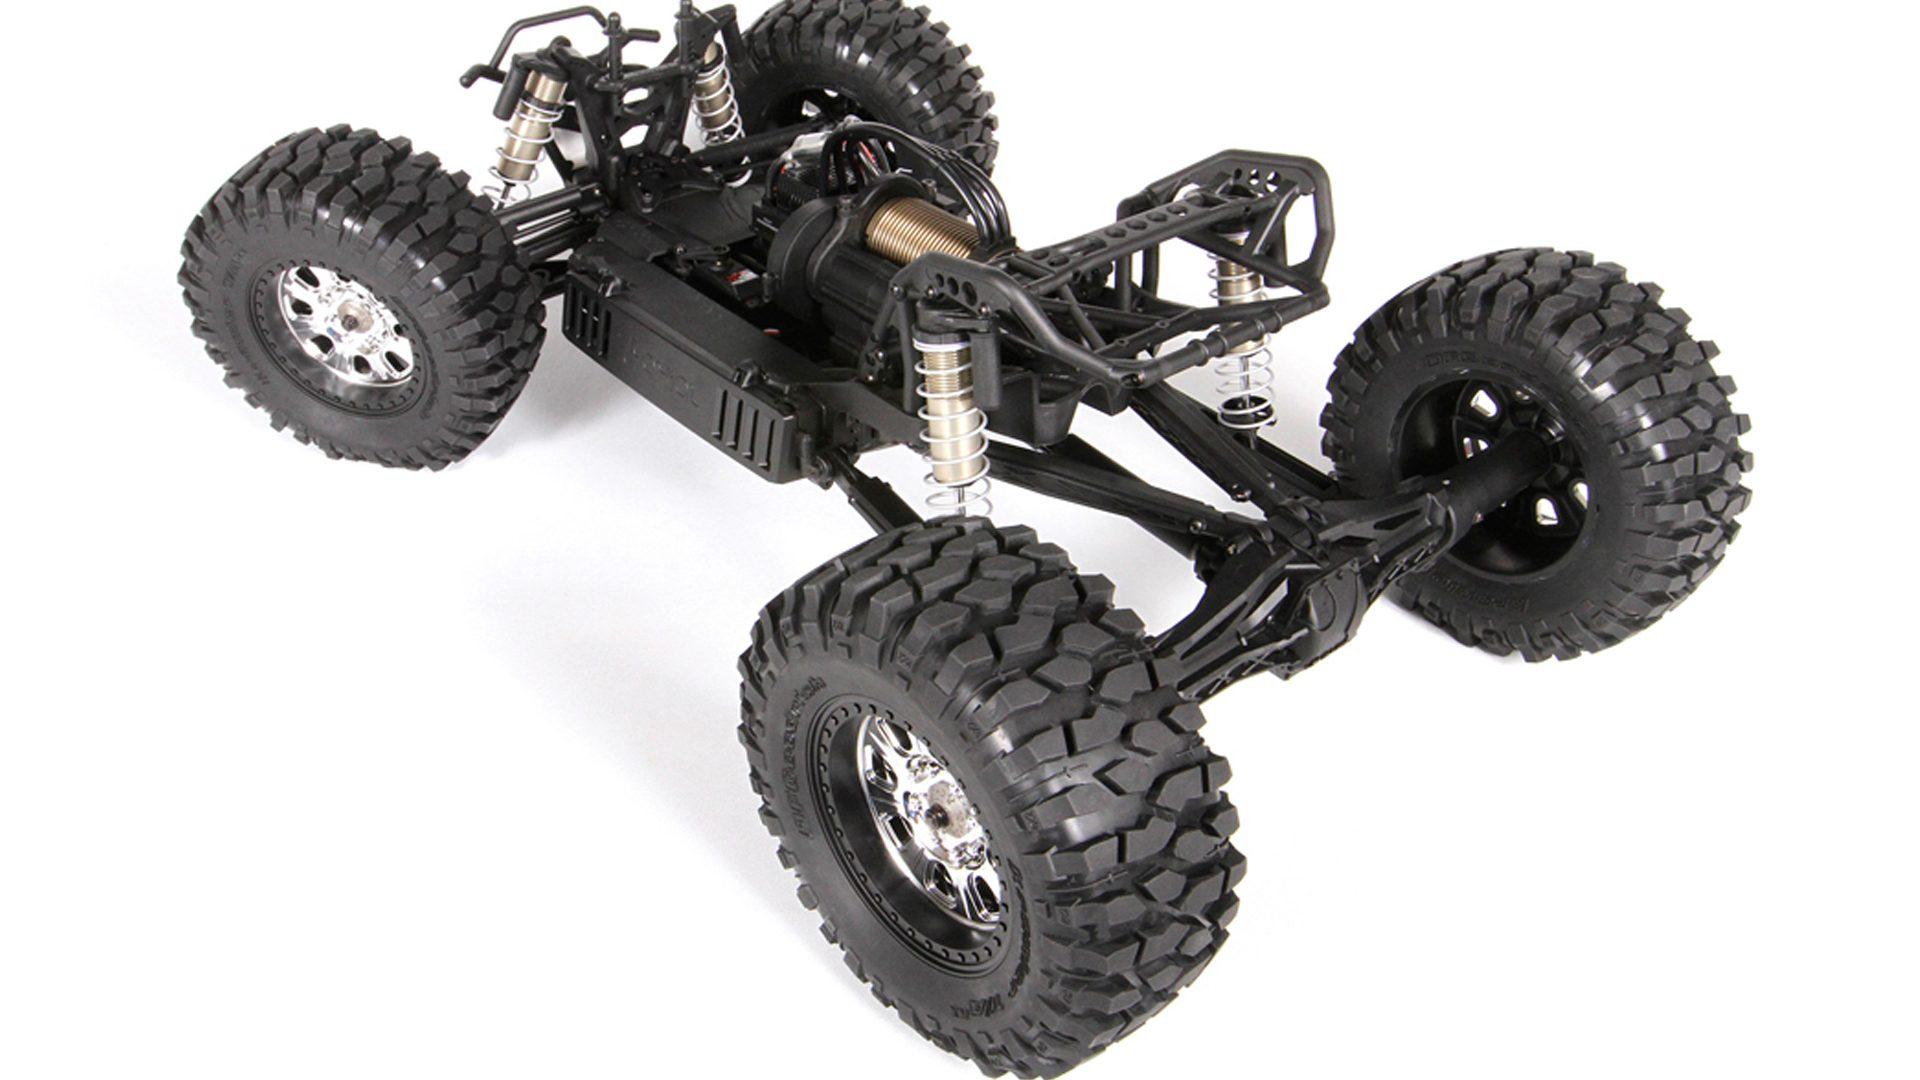 Yeti-Reifen-Motor-Aufhaengung_1